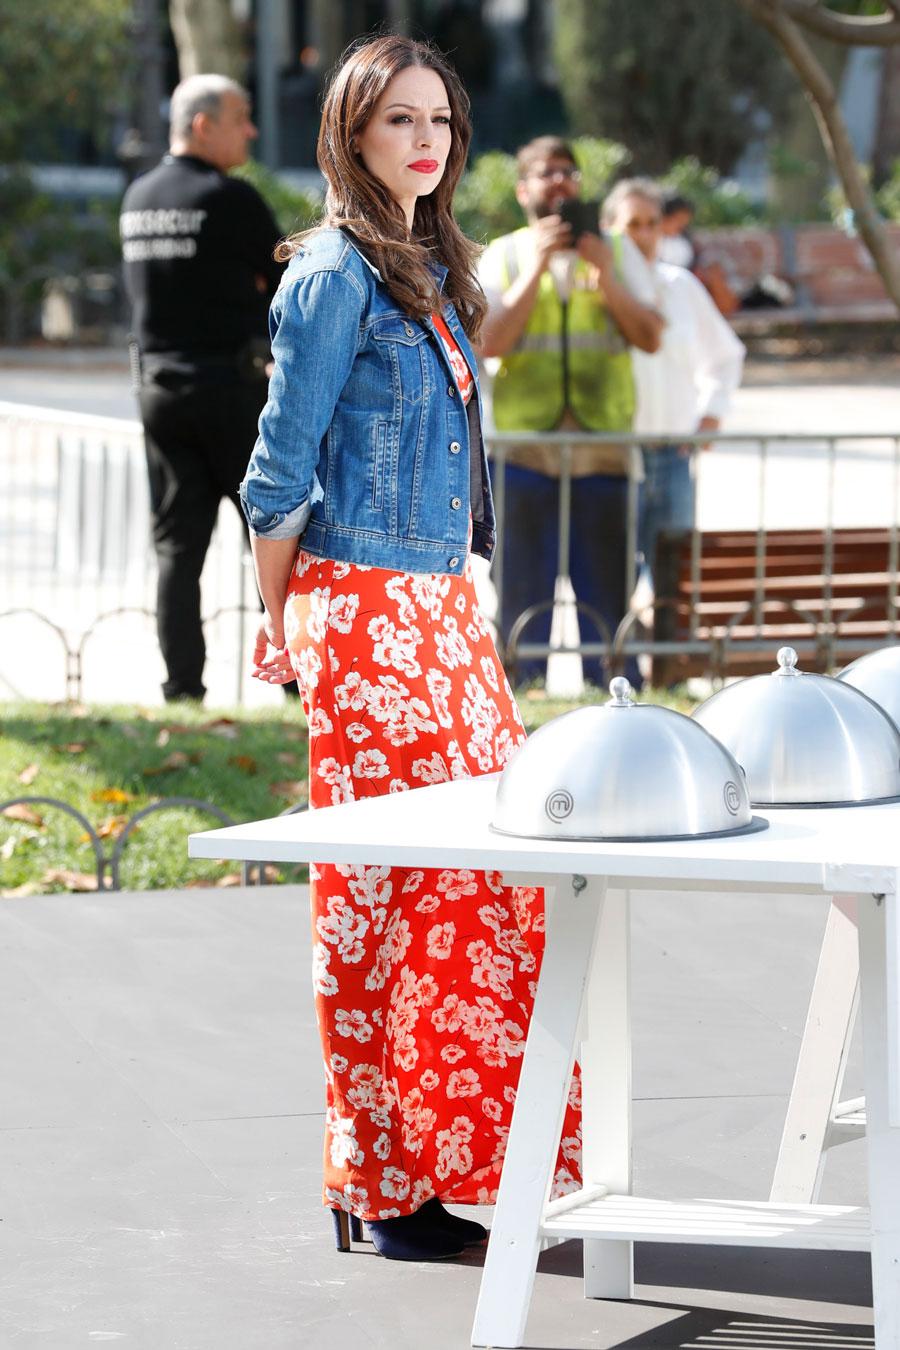 eva-gonzalez-vestido-flores de0d89e6. Top 4  Eva González 1a6e0026cd5